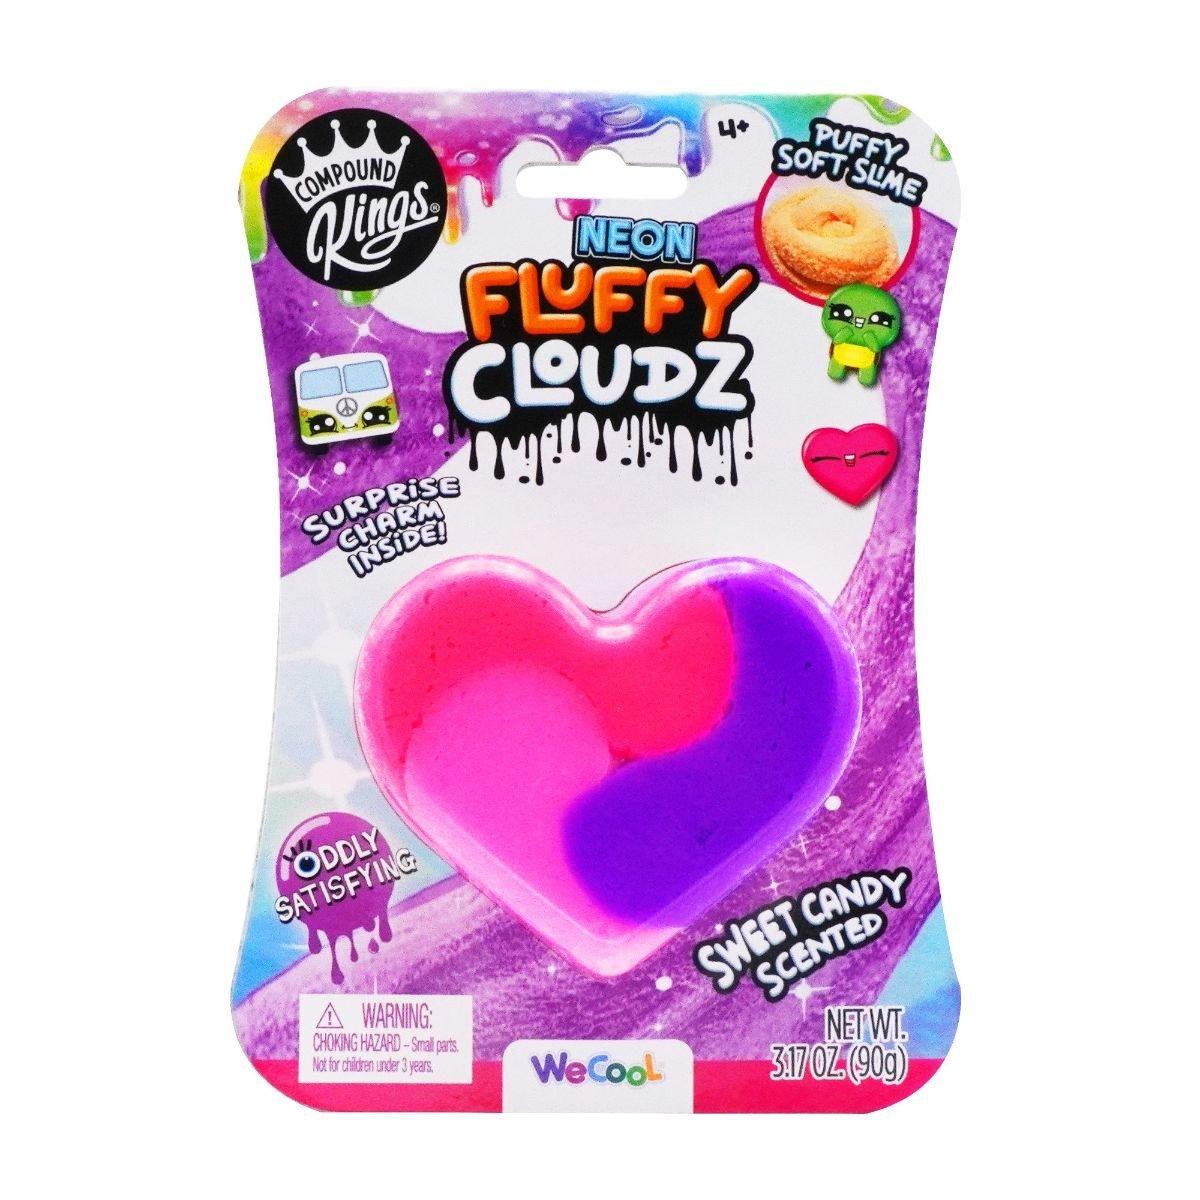 Slime parfumat cu surpriza, Compound Kings, Neon Fluffy Cloudz, Sweet Candy, 90 g